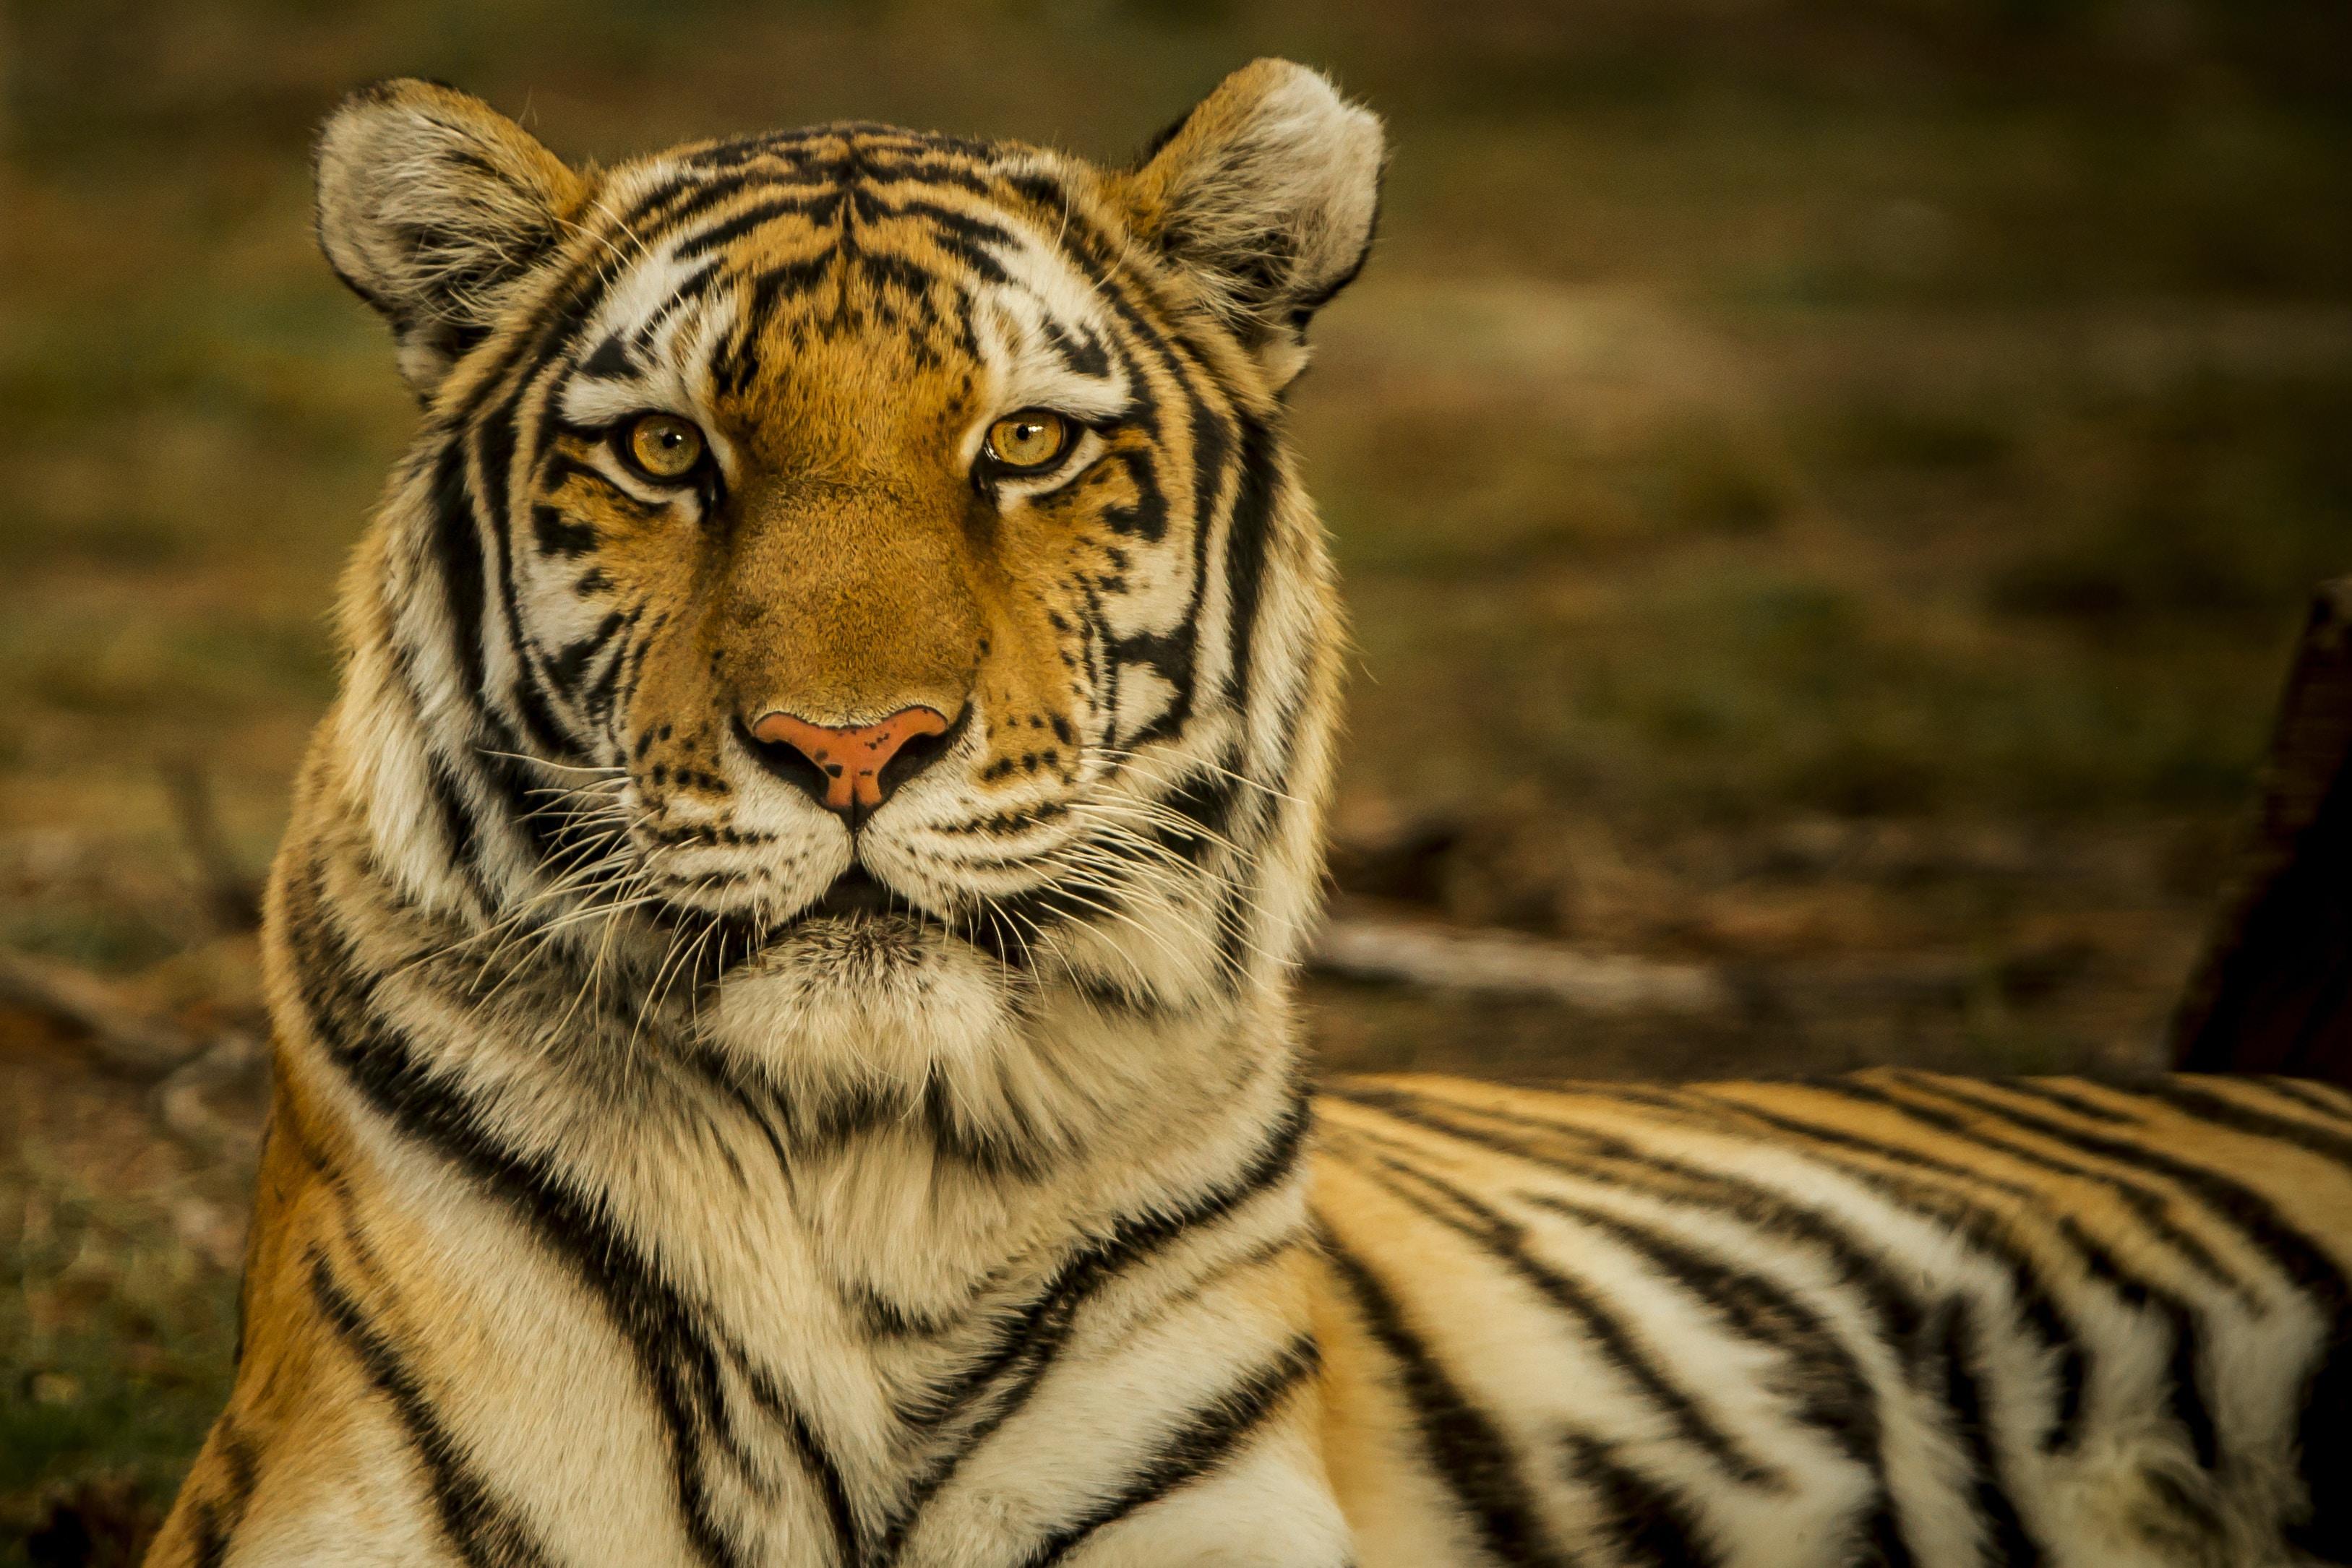 100 Tiger Pictures Download Free Images on Unsplash